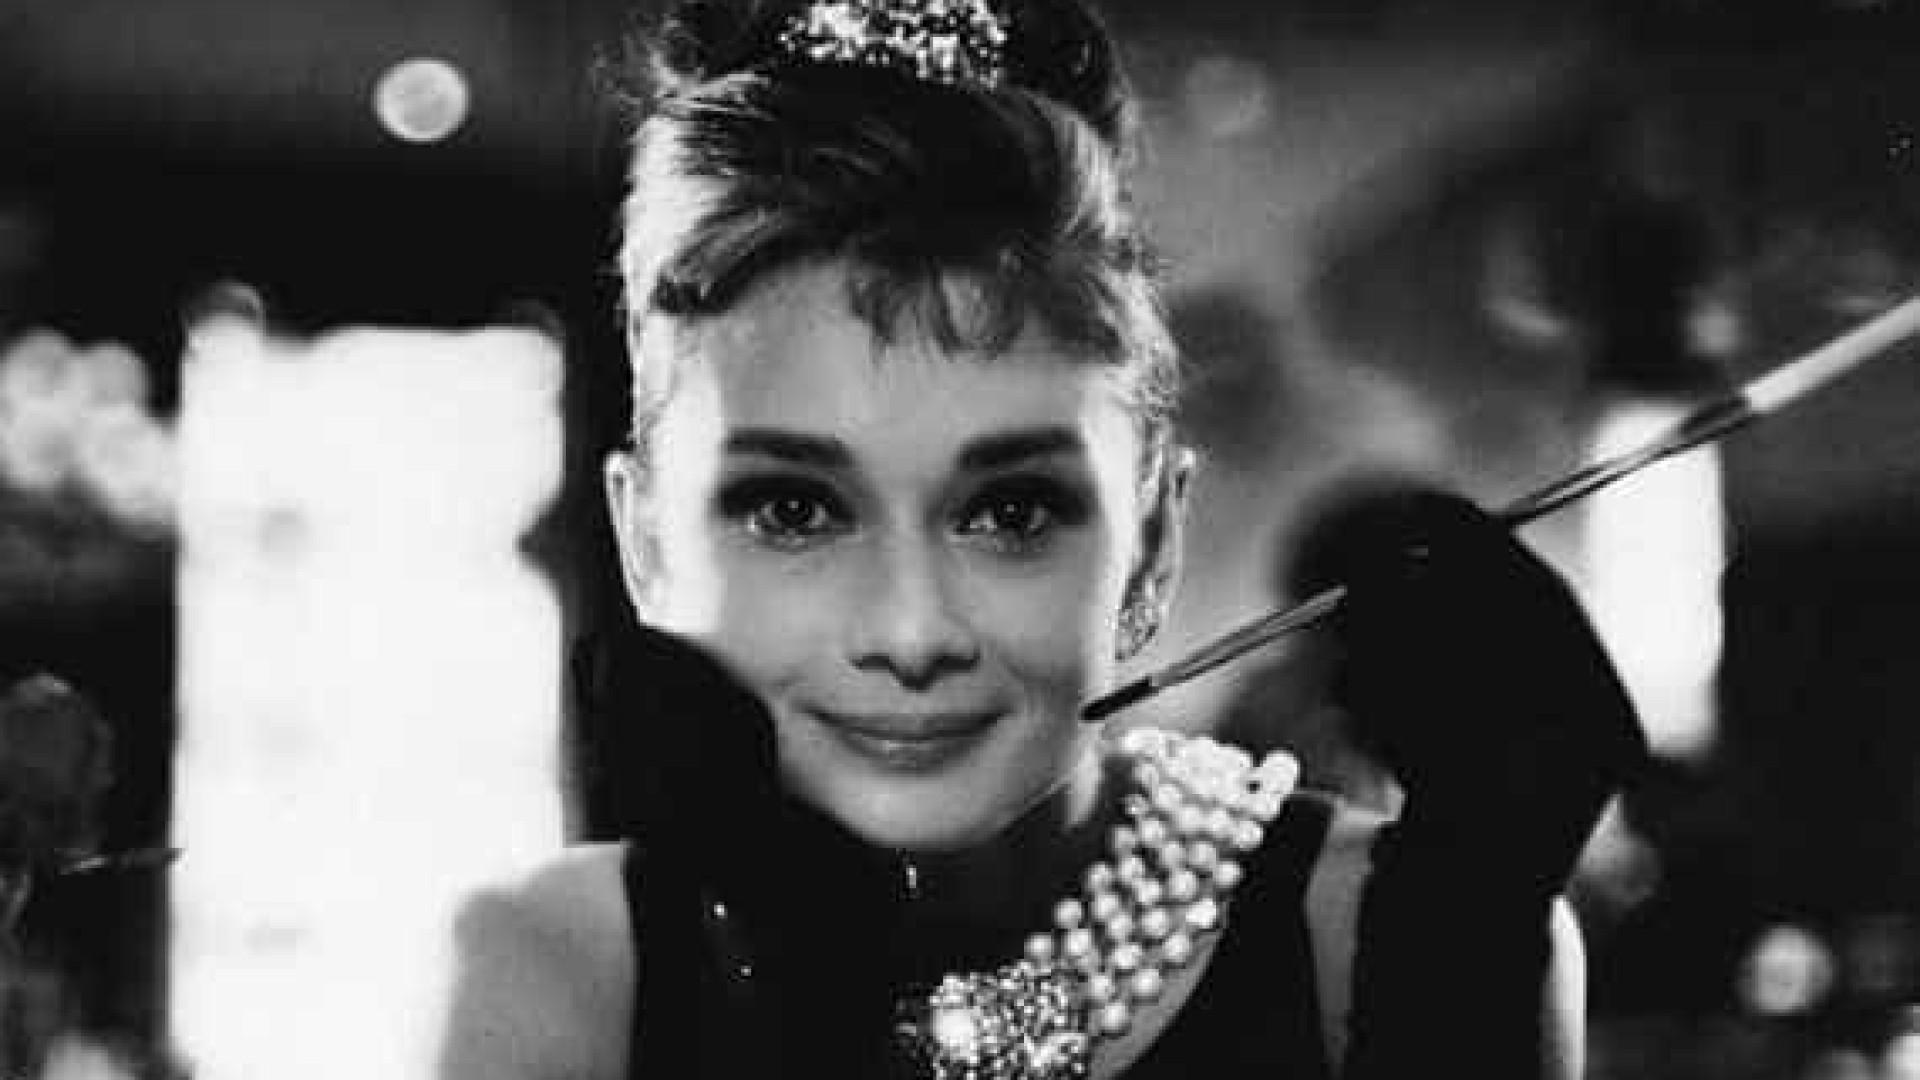 Livro confirma romance secreto entre John Kennedy e Audrey Hepburn